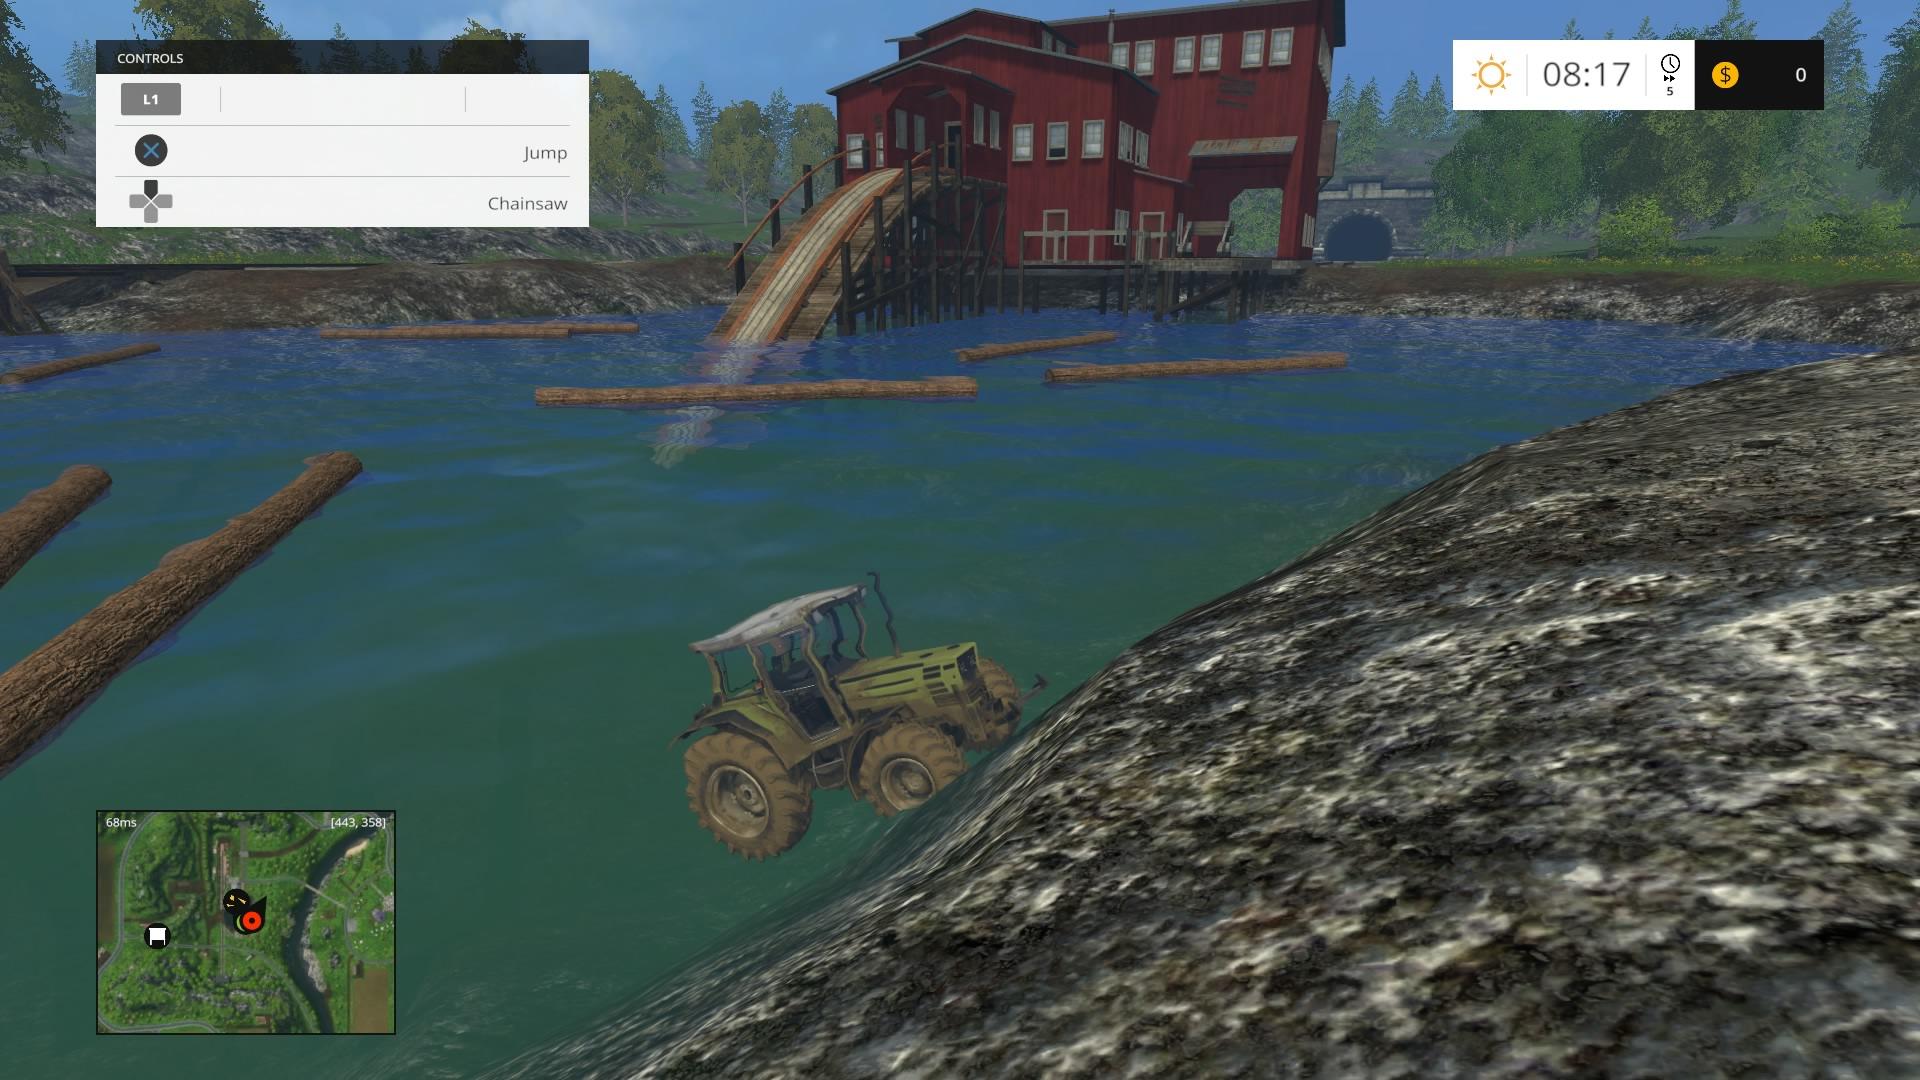 Farming-Simulator-15_20150518184018.jpg?fit=1920%2C1080&ssl=1